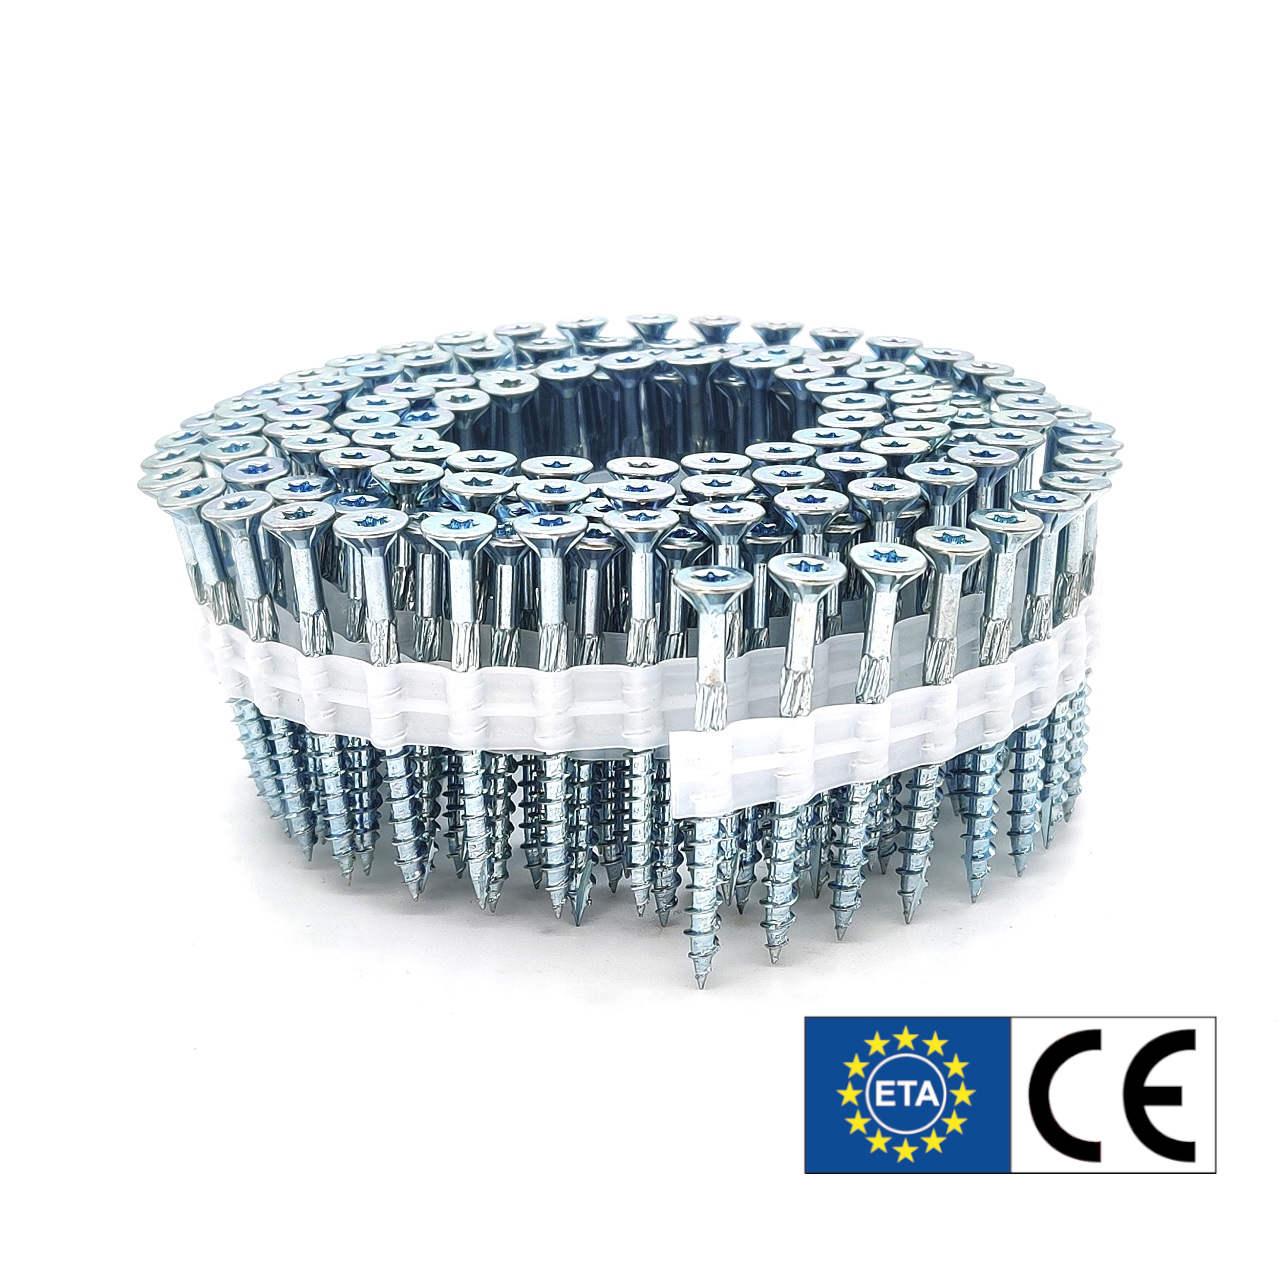 Coil adunox-SuperUni Holzschrauben / Spanplattenschrauben | hell verzinkt | ETA | 5,0x80 | 750 Stk